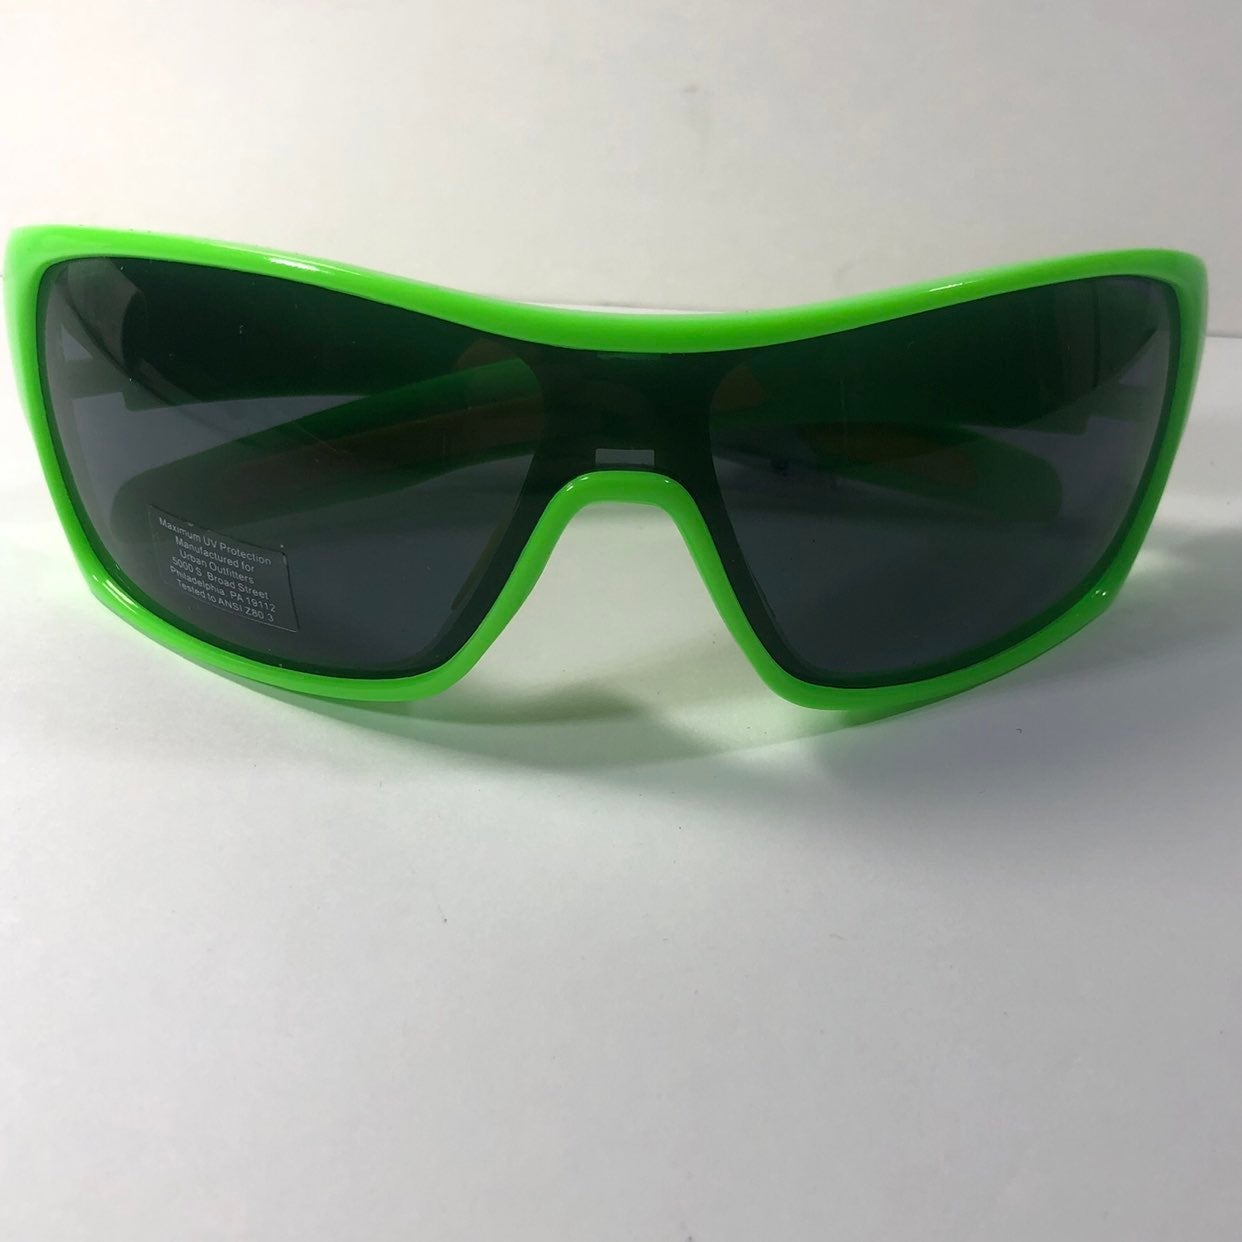 90s Style Green Yellow Sunglasses